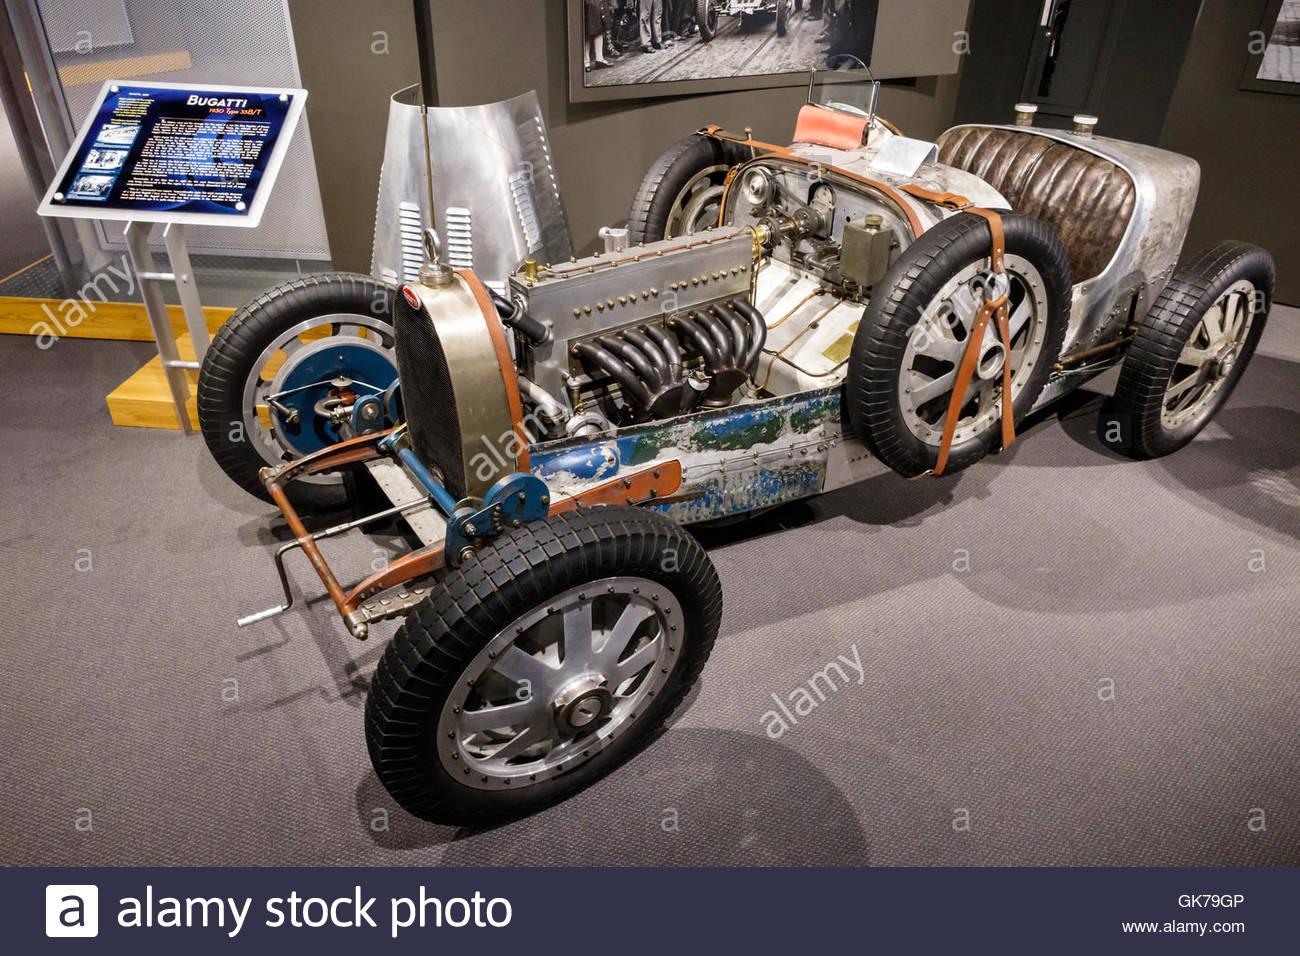 Naples Florida Revs Institute of Automotive Research automotive car museum Miles Collier private collection rare - Stock Image